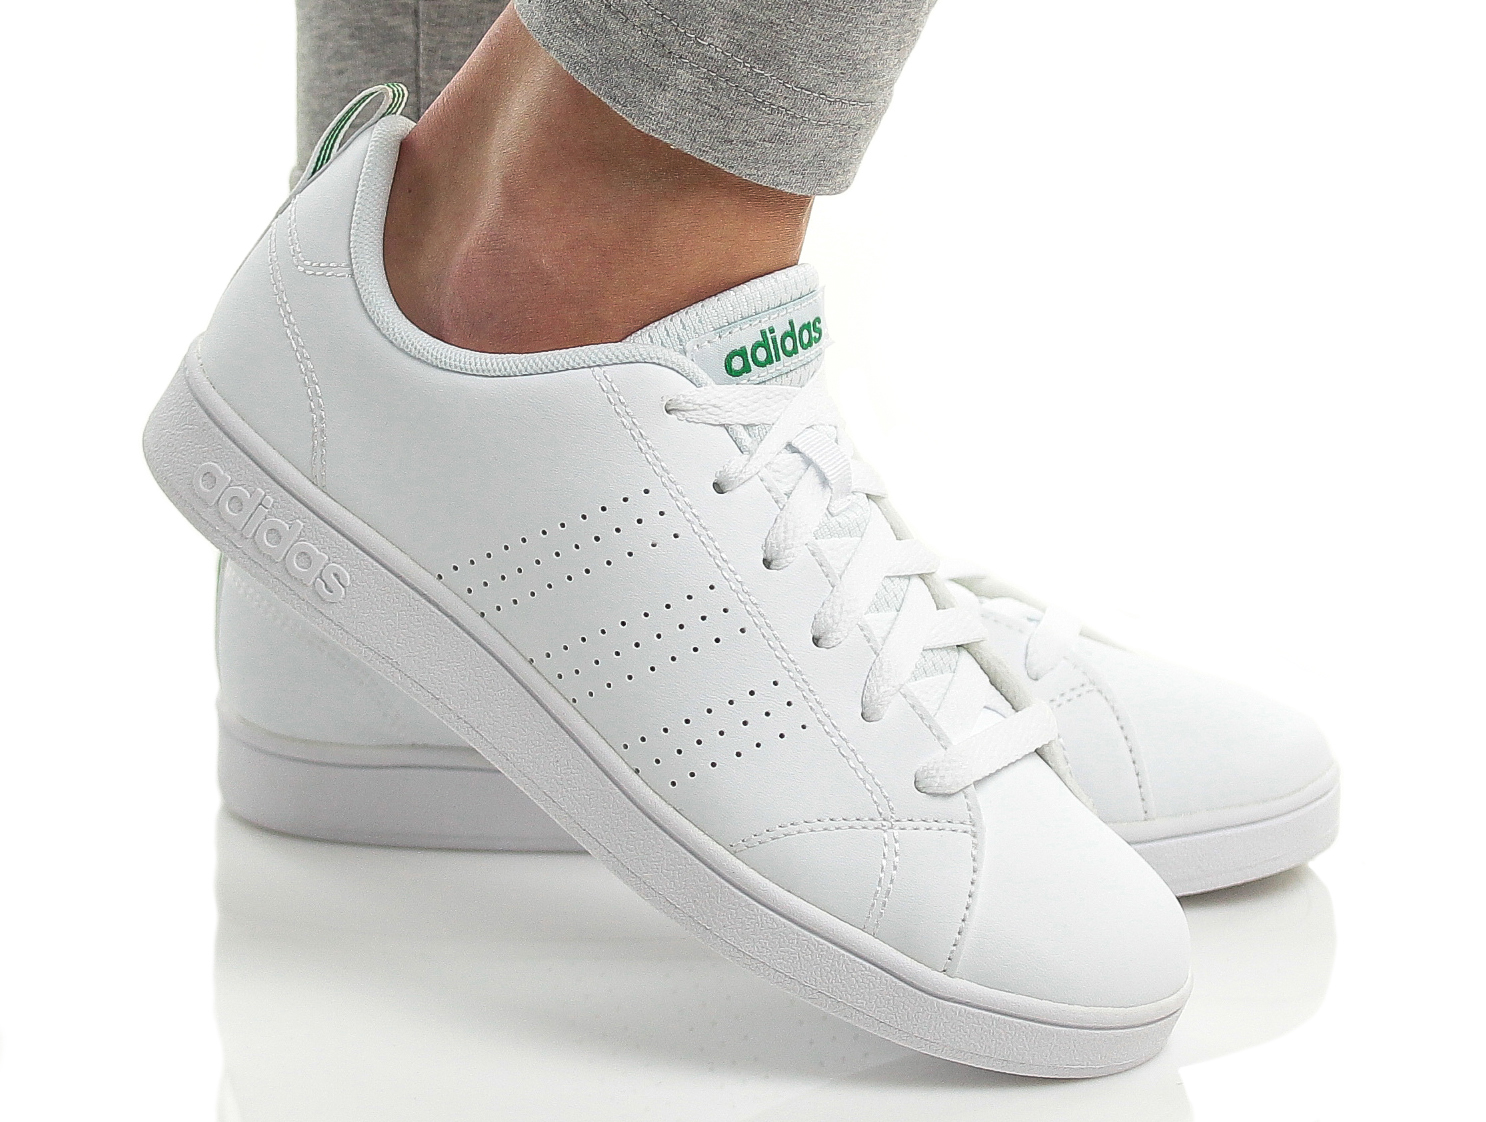 Buty adidas VS ADVANTAGE CLEAN AW4884 6590173234